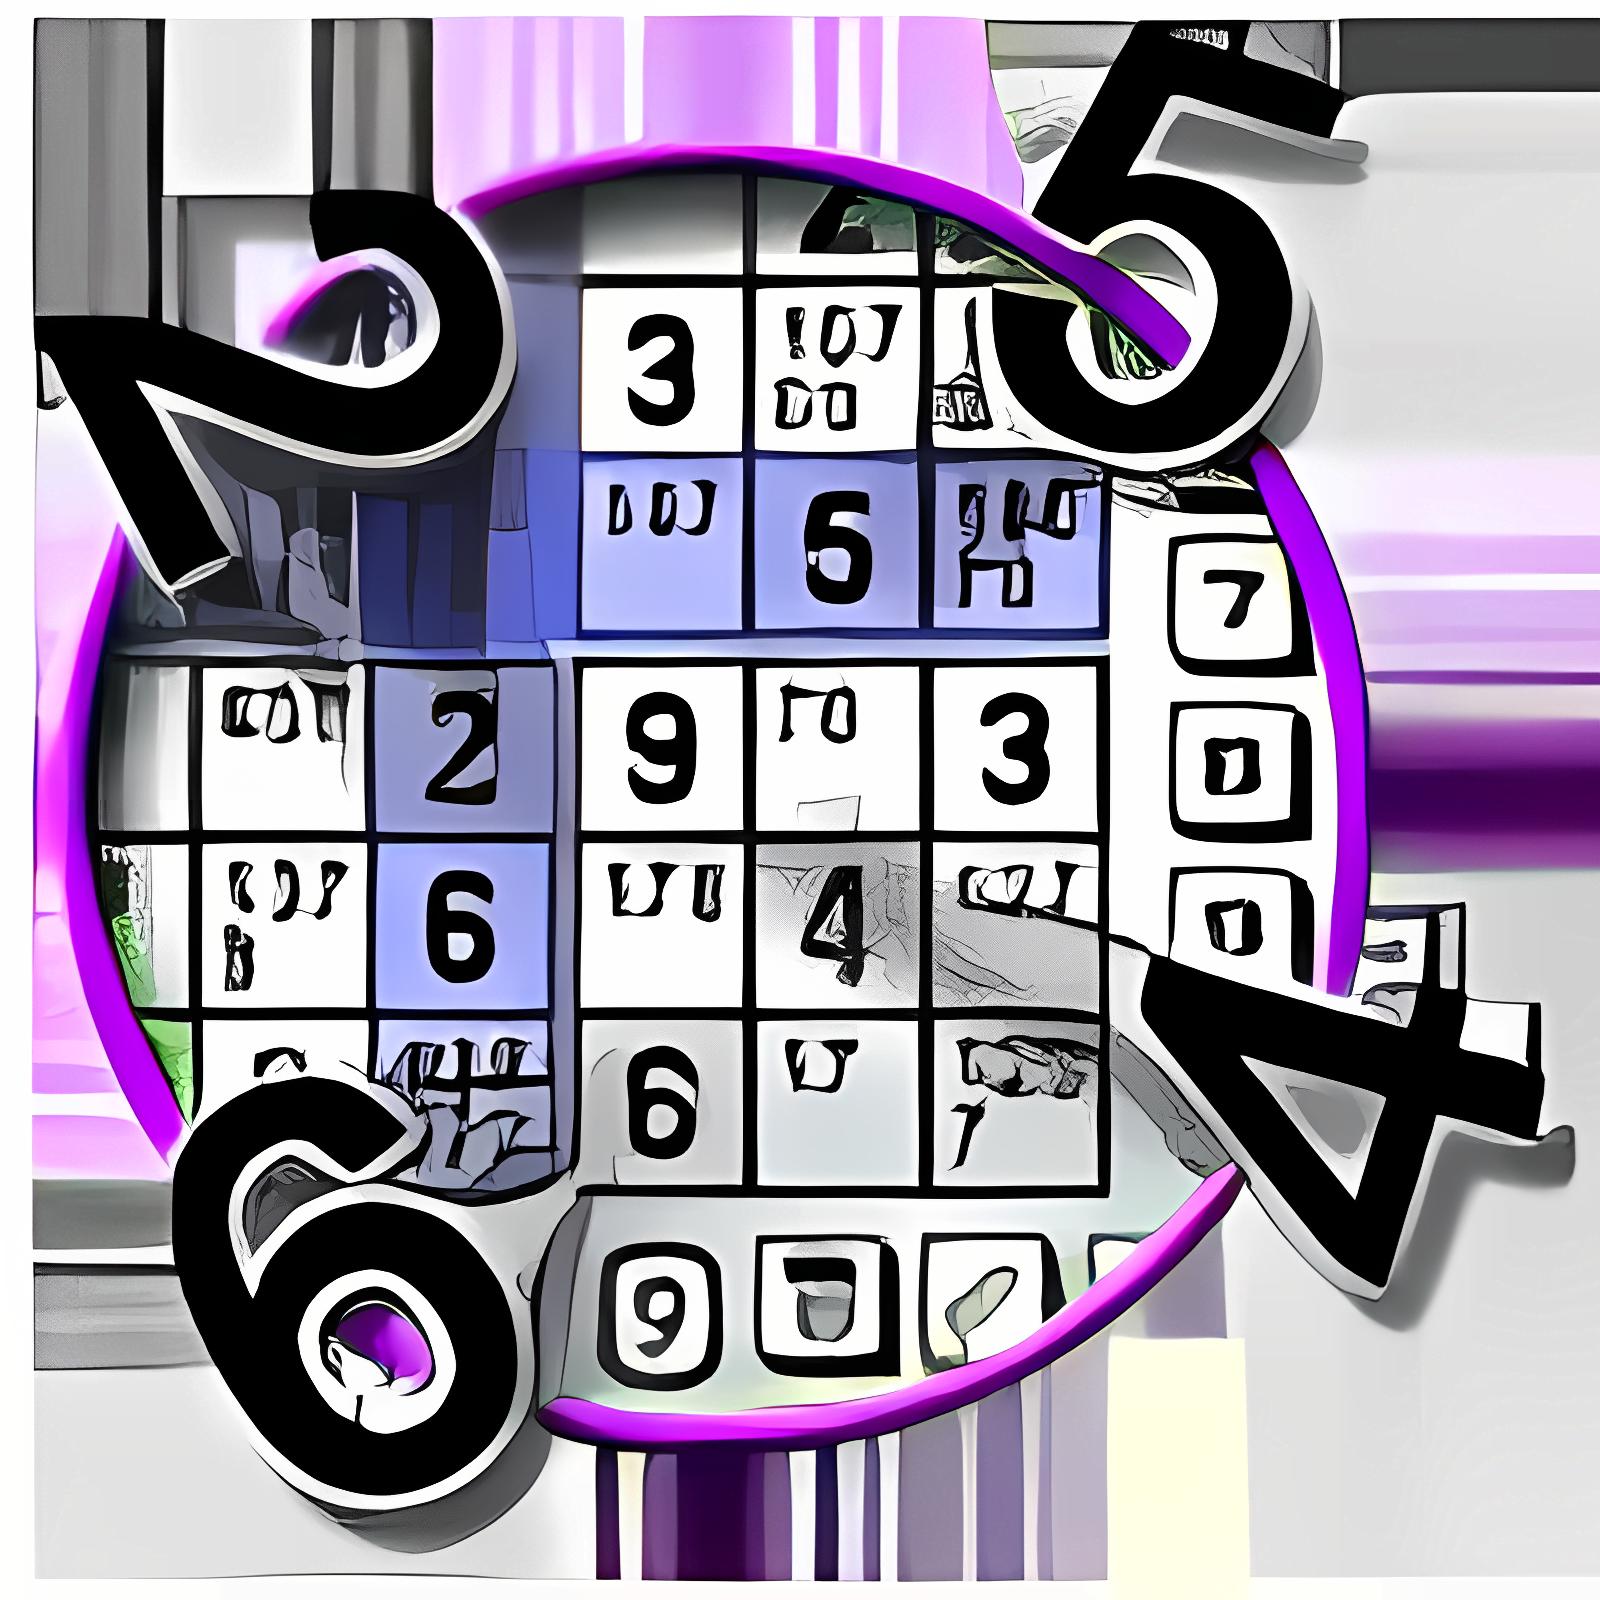 Astraware Sudoku